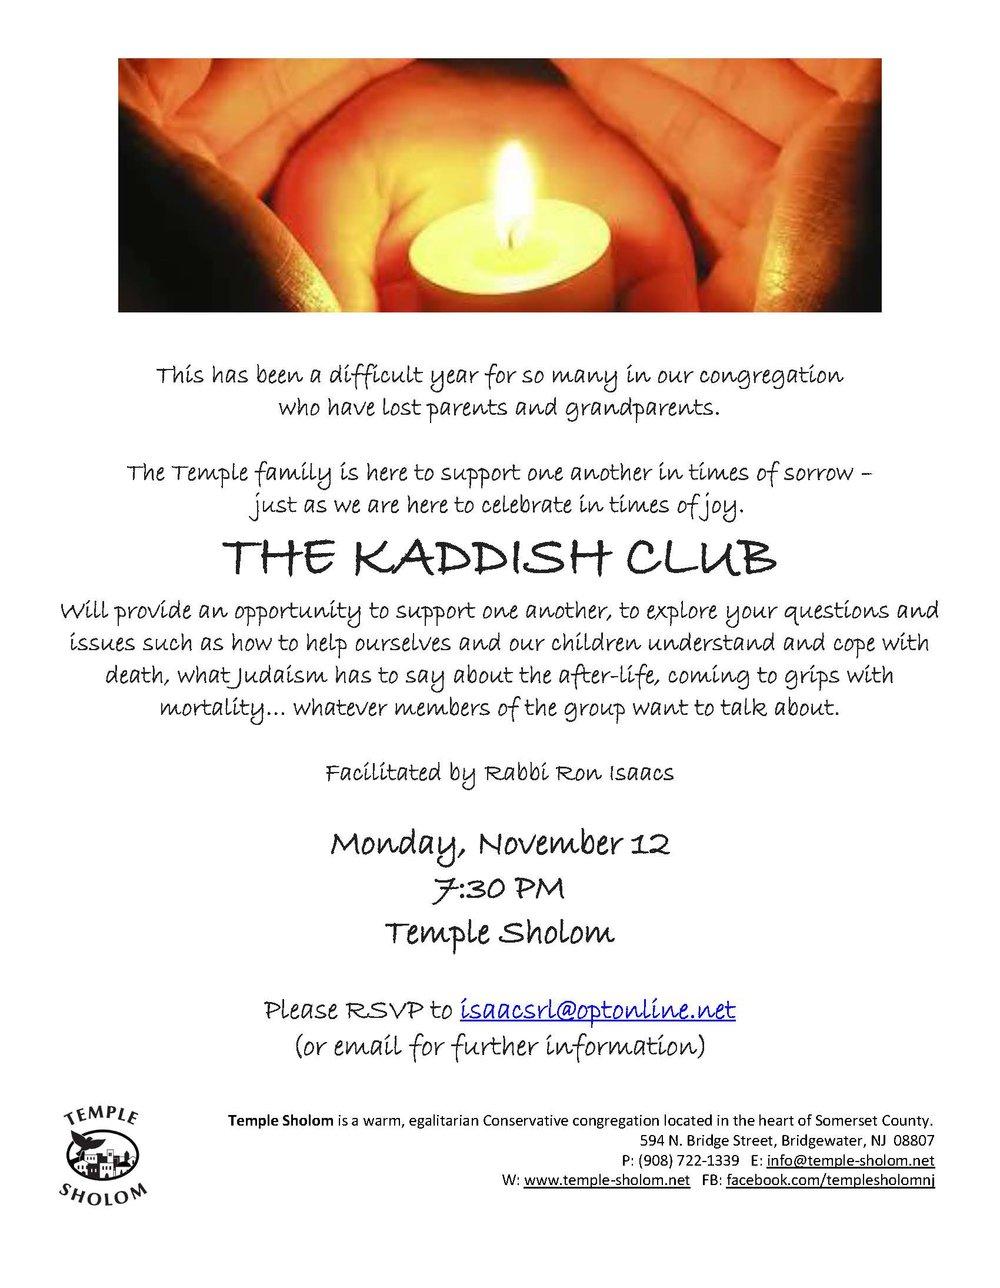 kaddish club revised 9.26.18.jpg